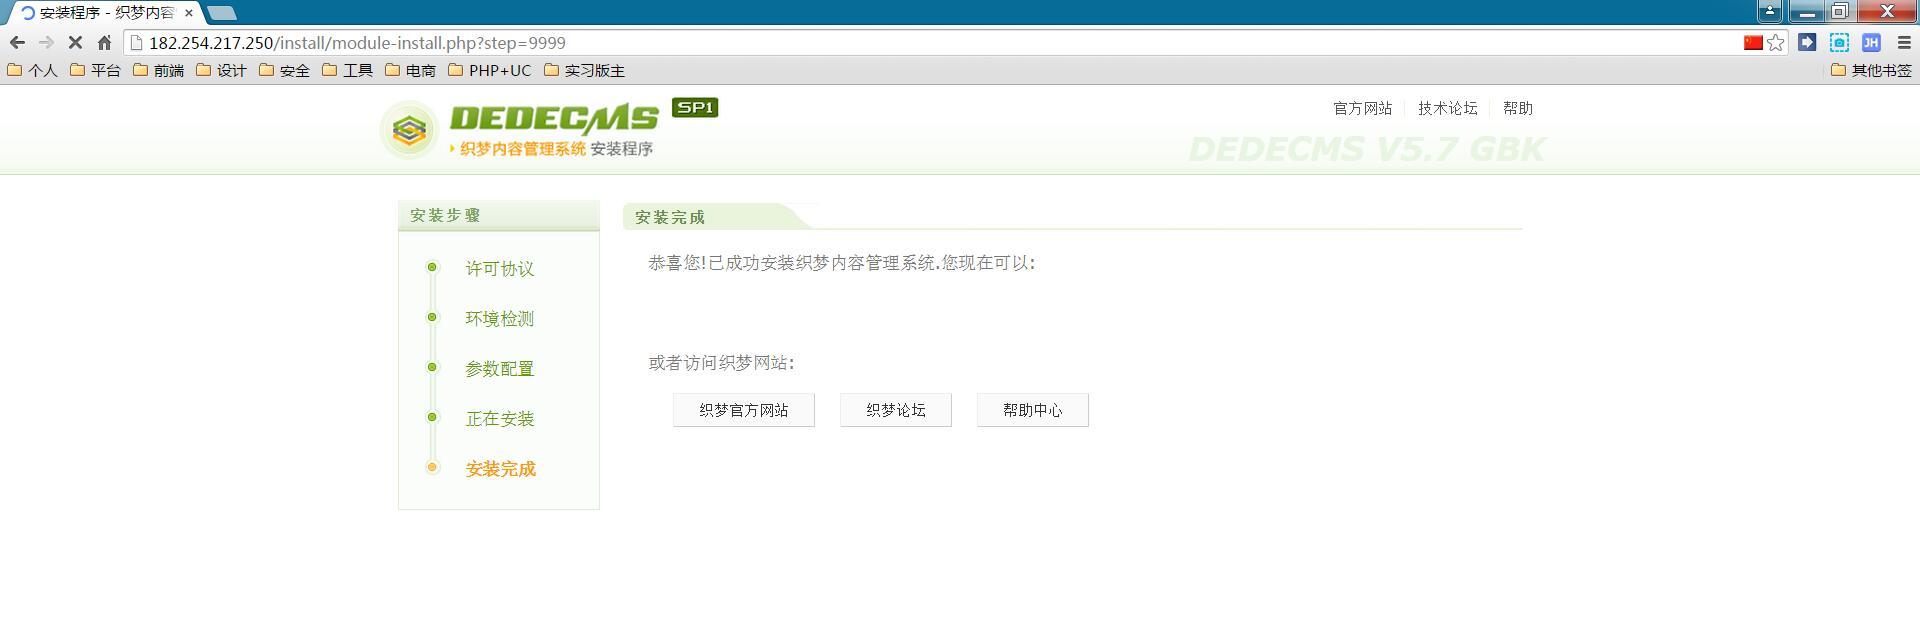 DeDeCMS/织梦CMS 程式搭建教程(Windows环境)